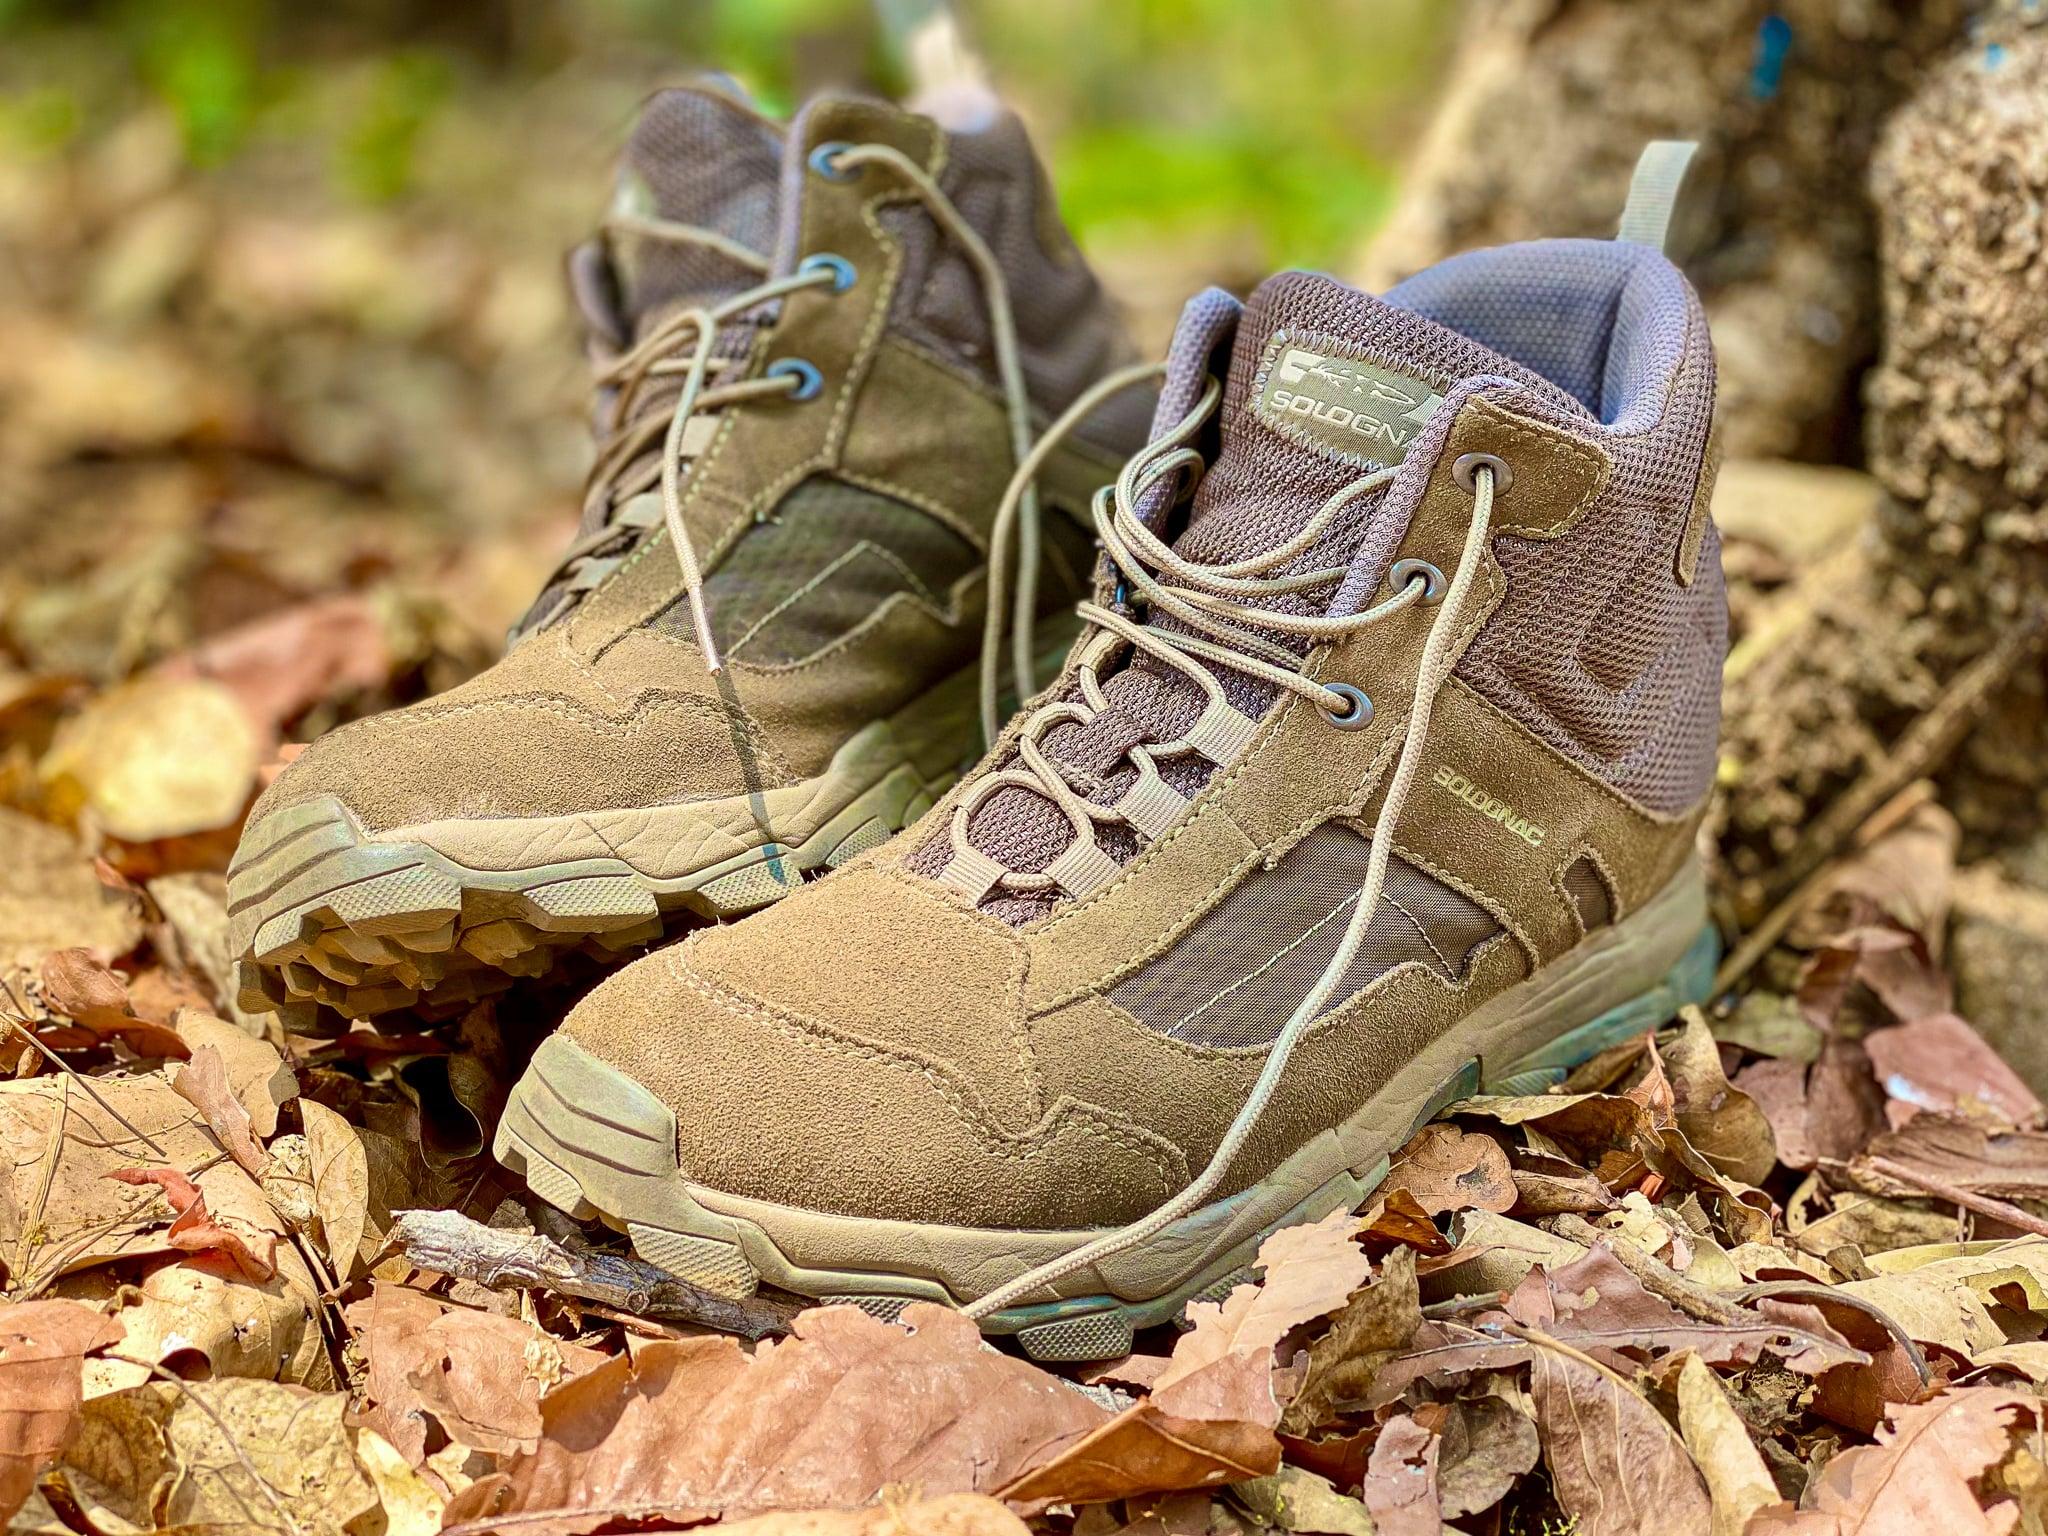 SOLOGNAC Men's Boots 300 Beige - First Hand Field Review